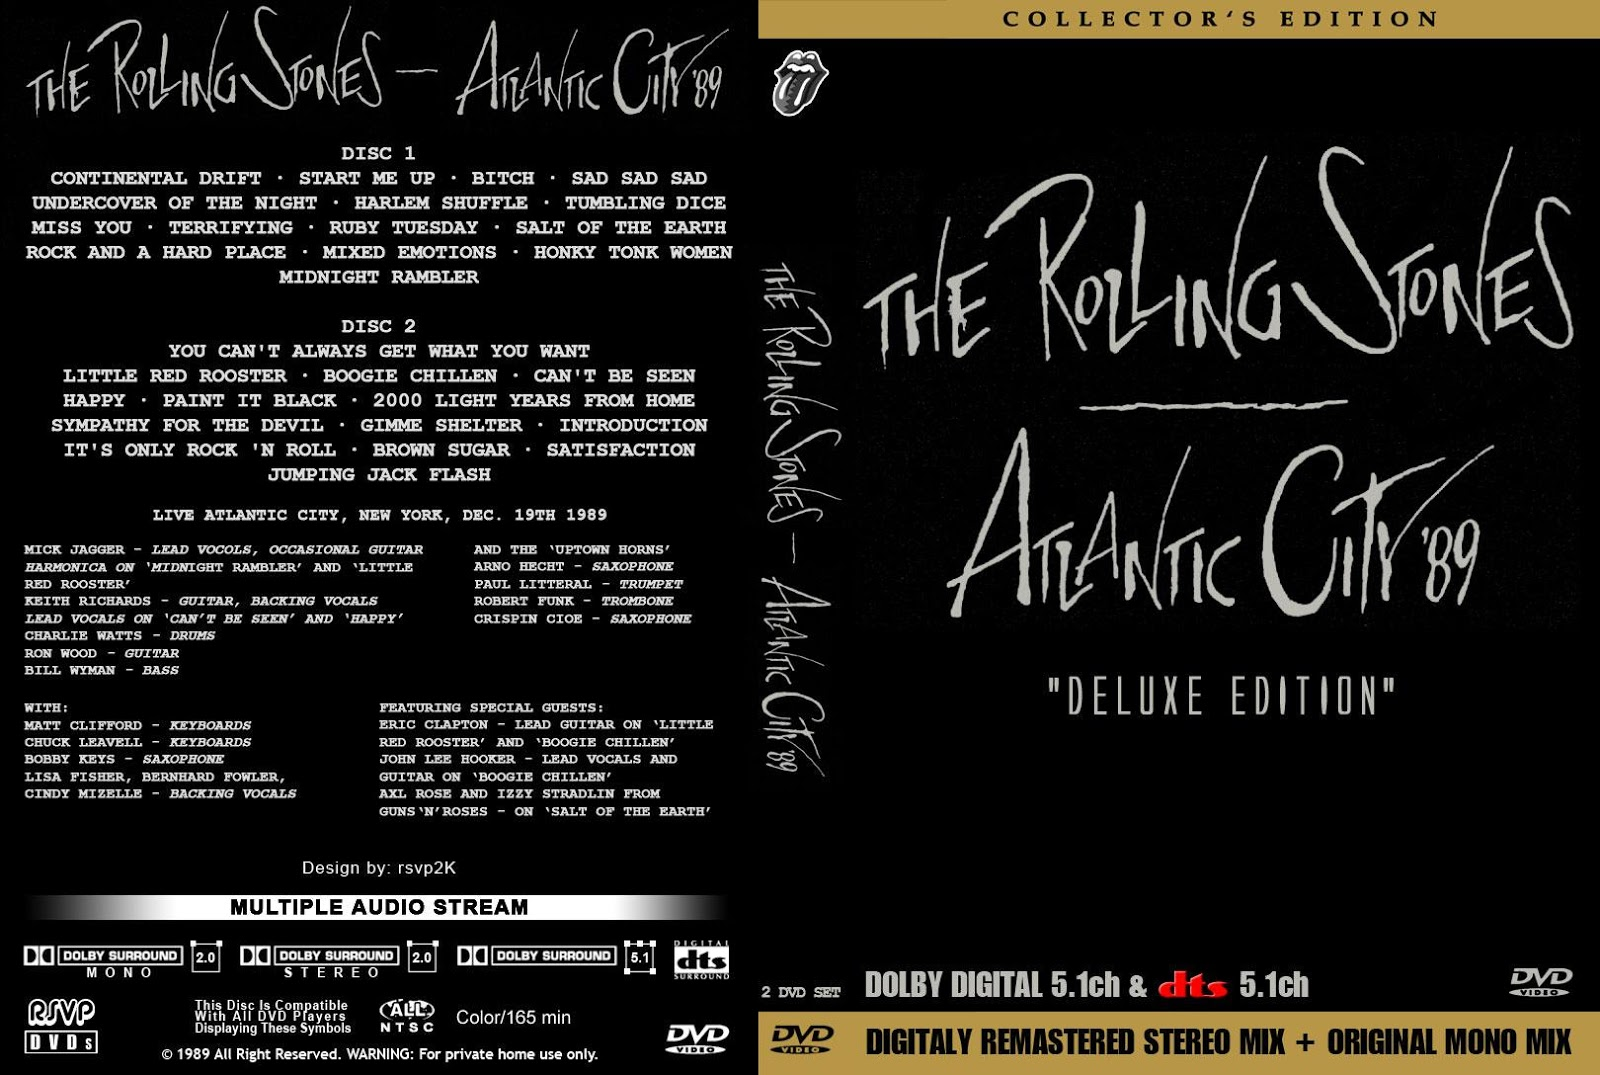 Bootleg Rambler The Rolling Stones 1989 12 19 Atlantic